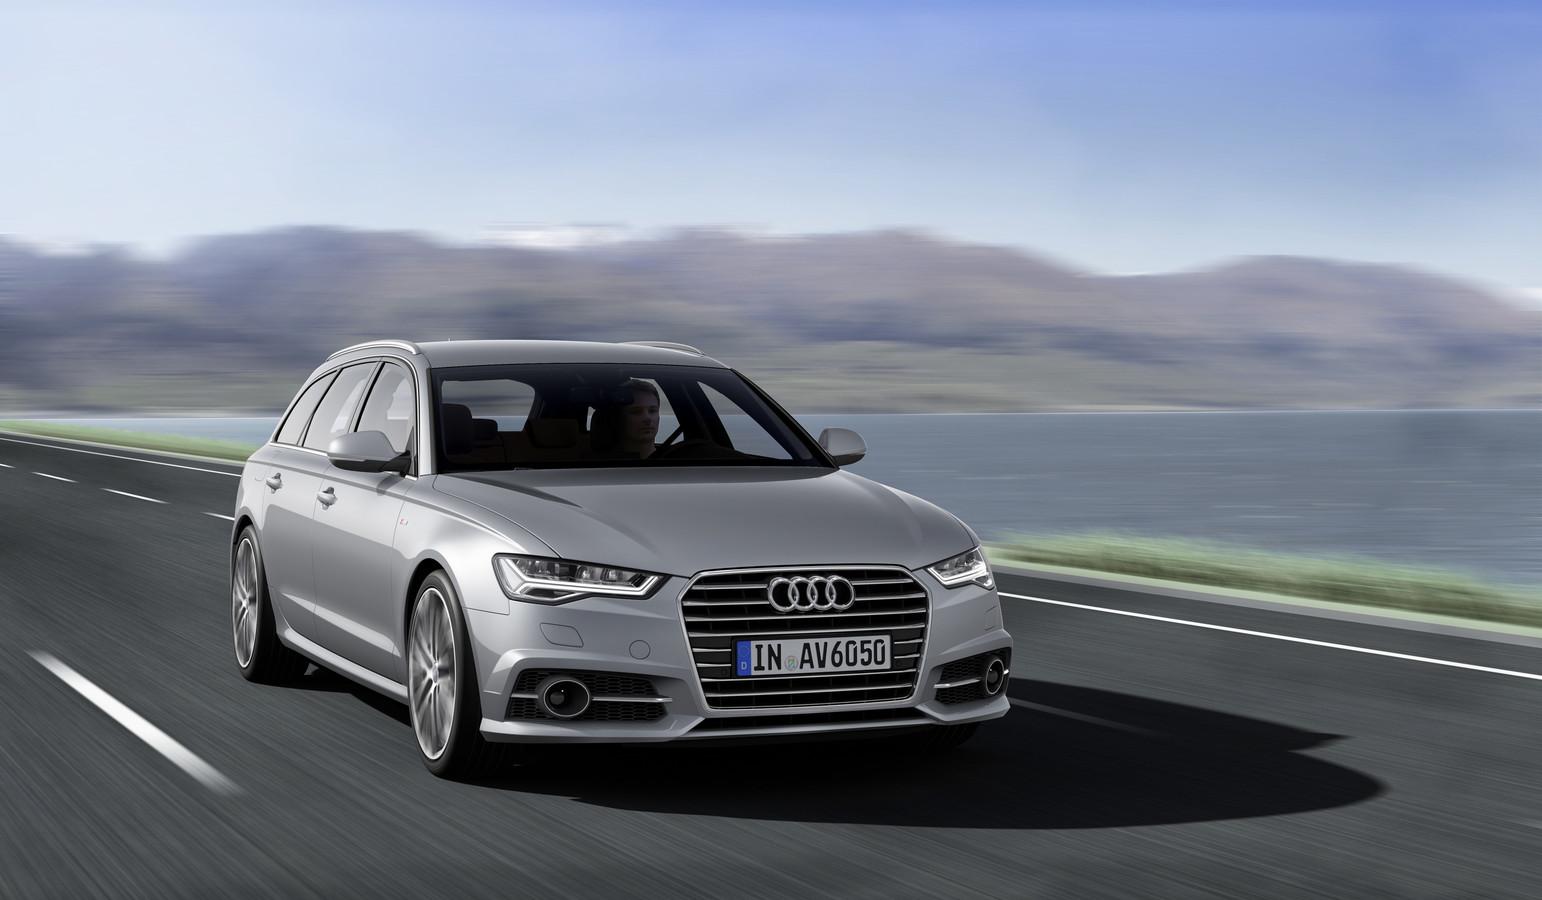 Pijlsnelle Audi A6 Moet Politie Helpen Plofkrakers In Te